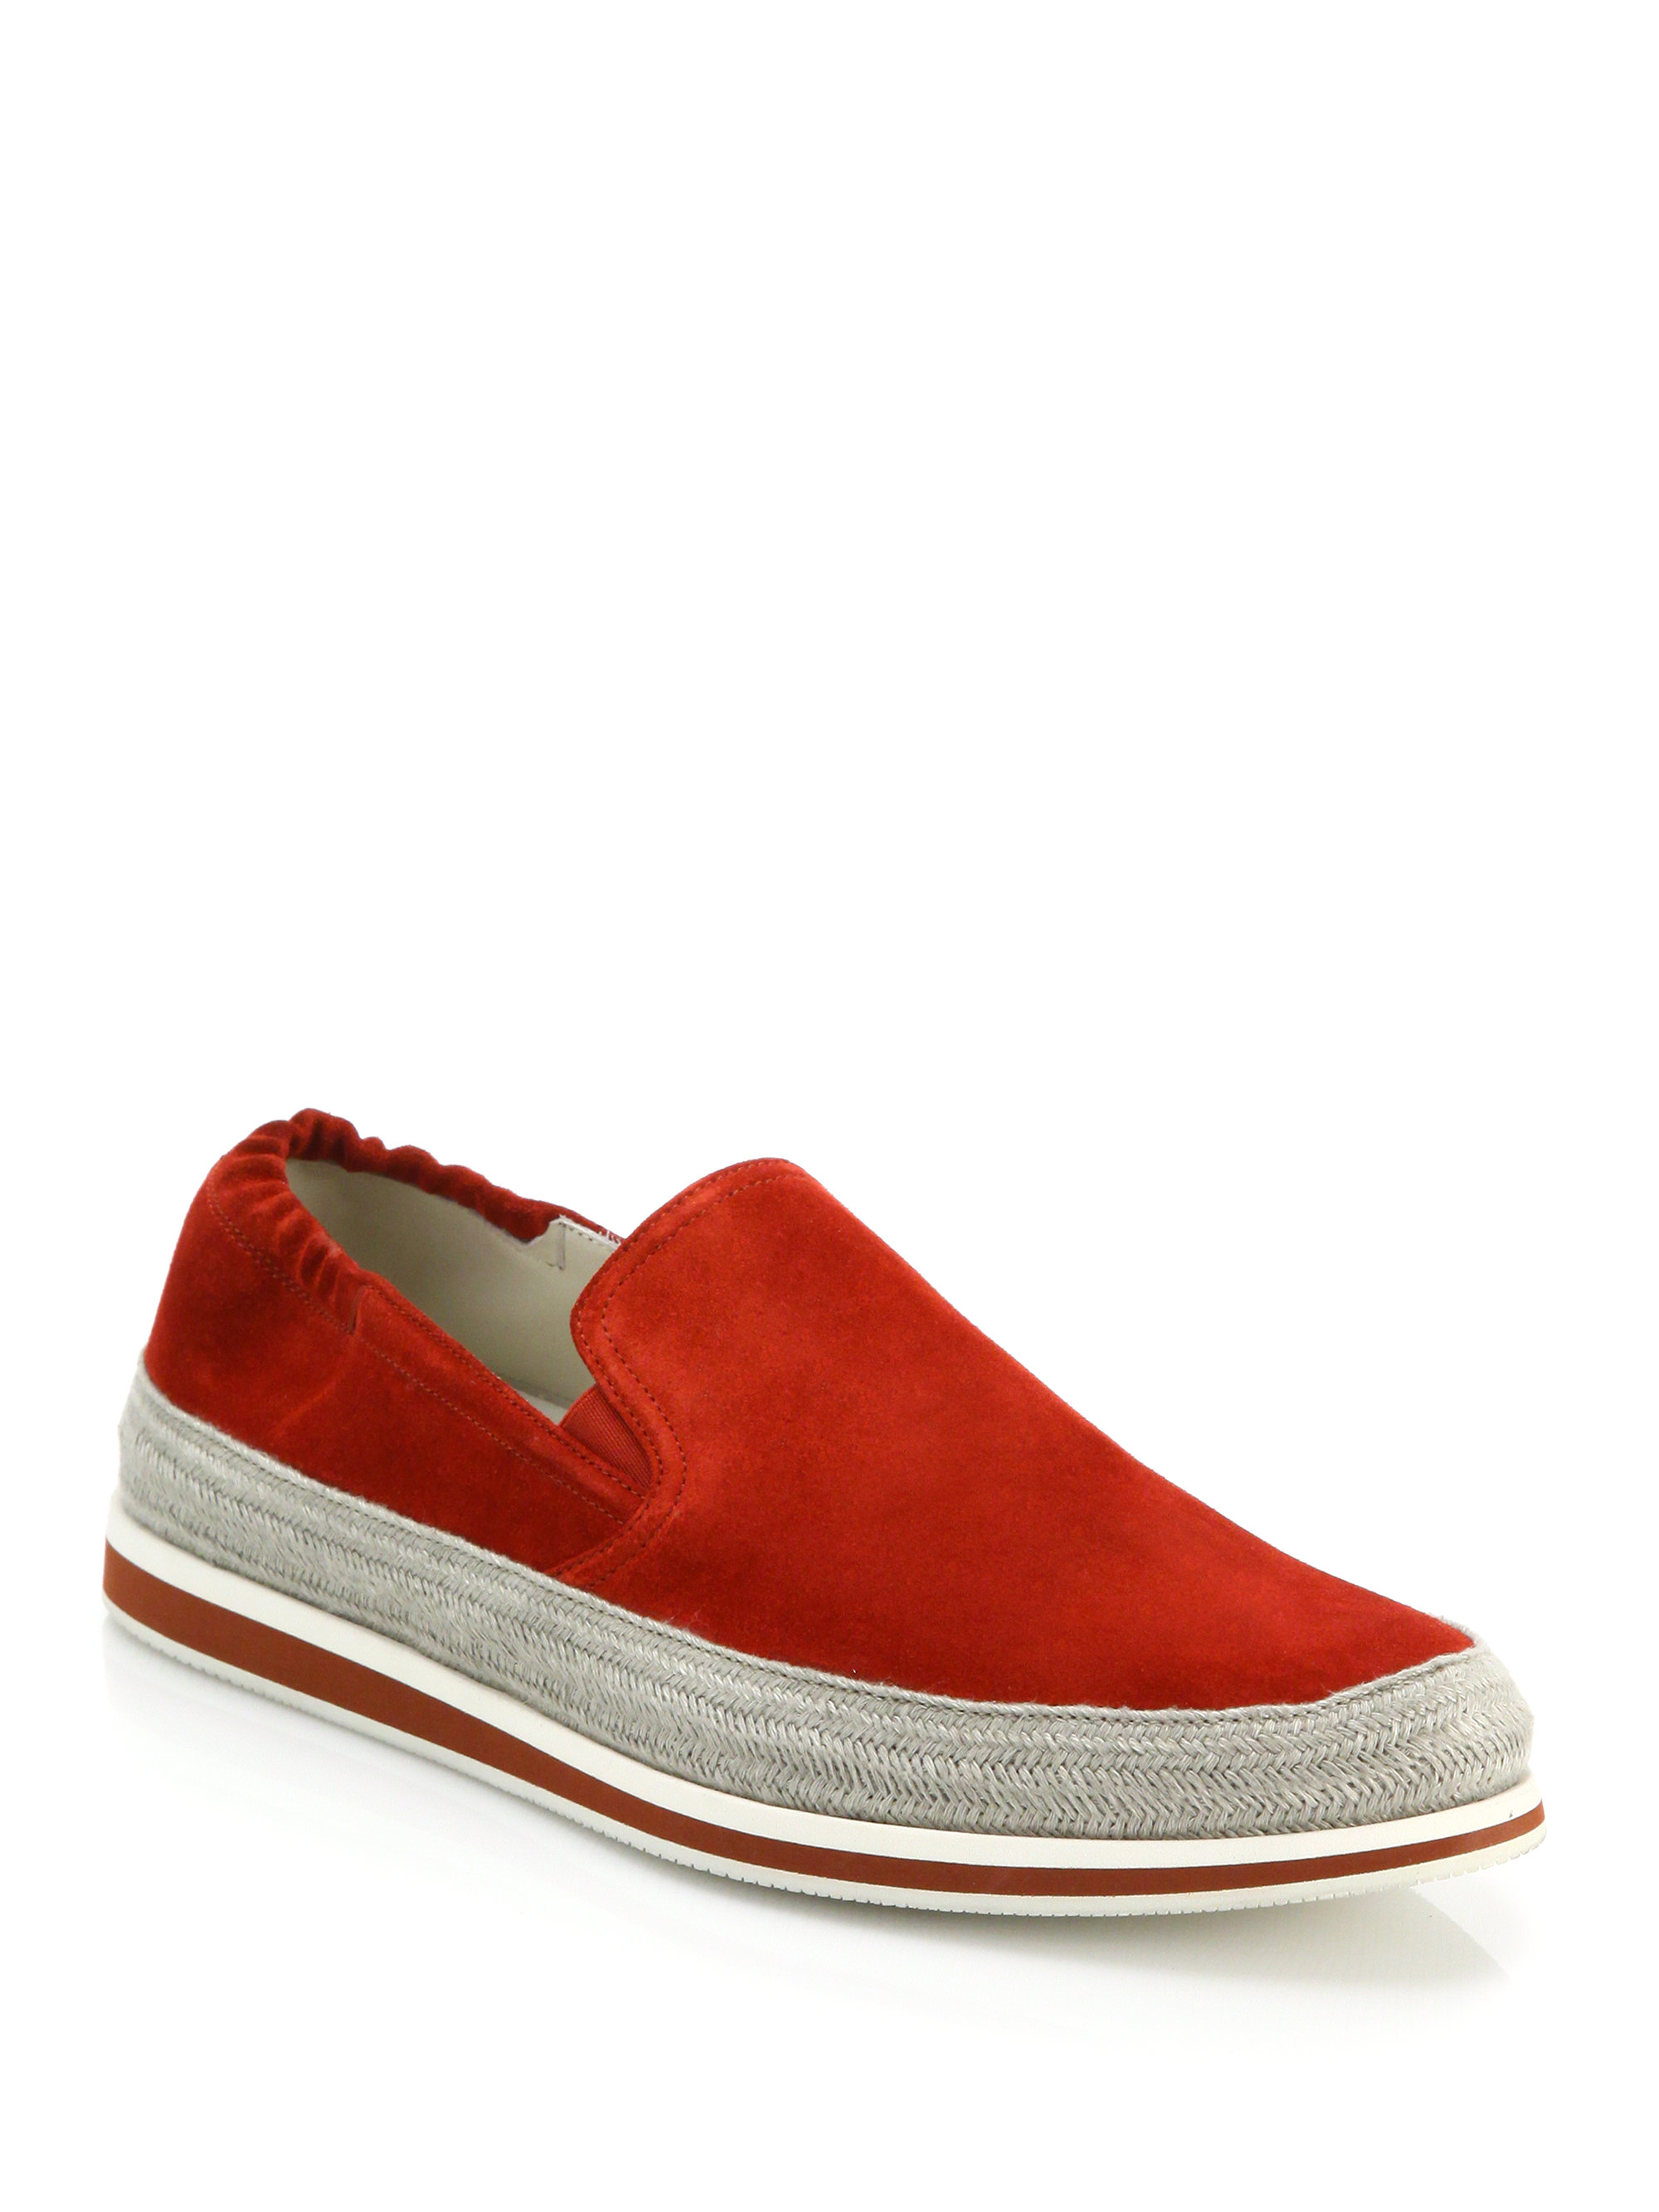 Saks Prada Sale Shoes